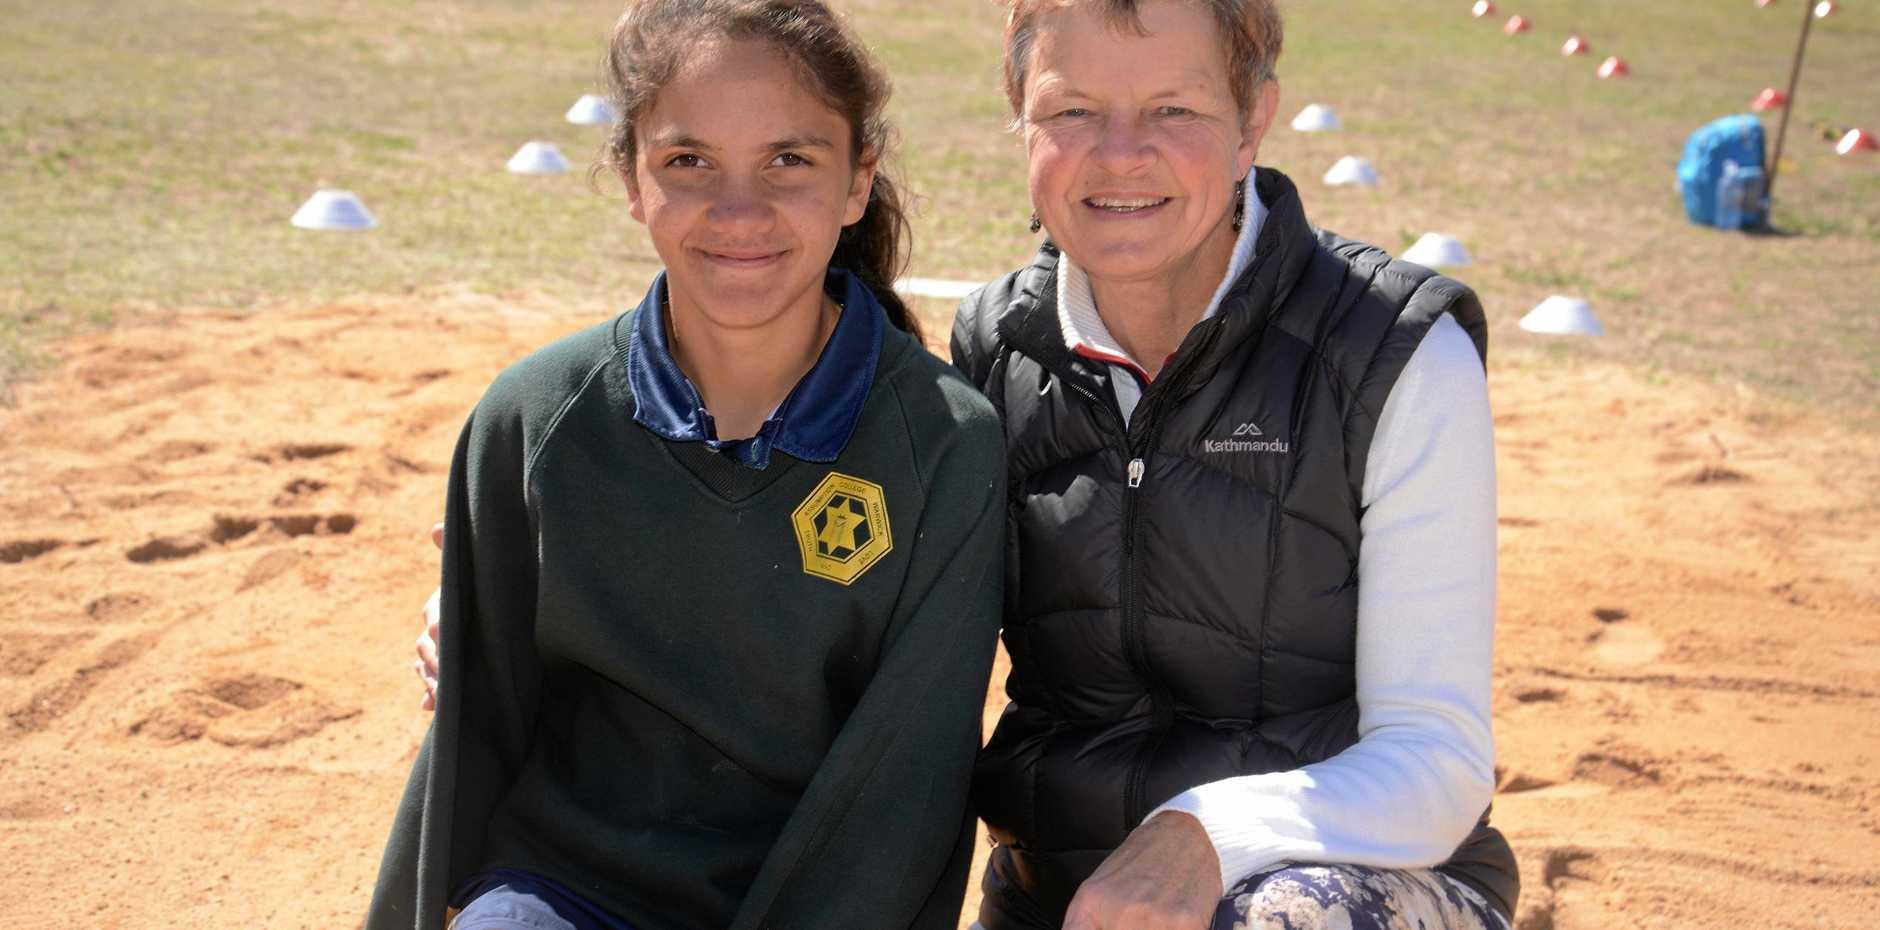 Recordholders Denika Murray and Susan Swann at Warwick All Schools Sports.